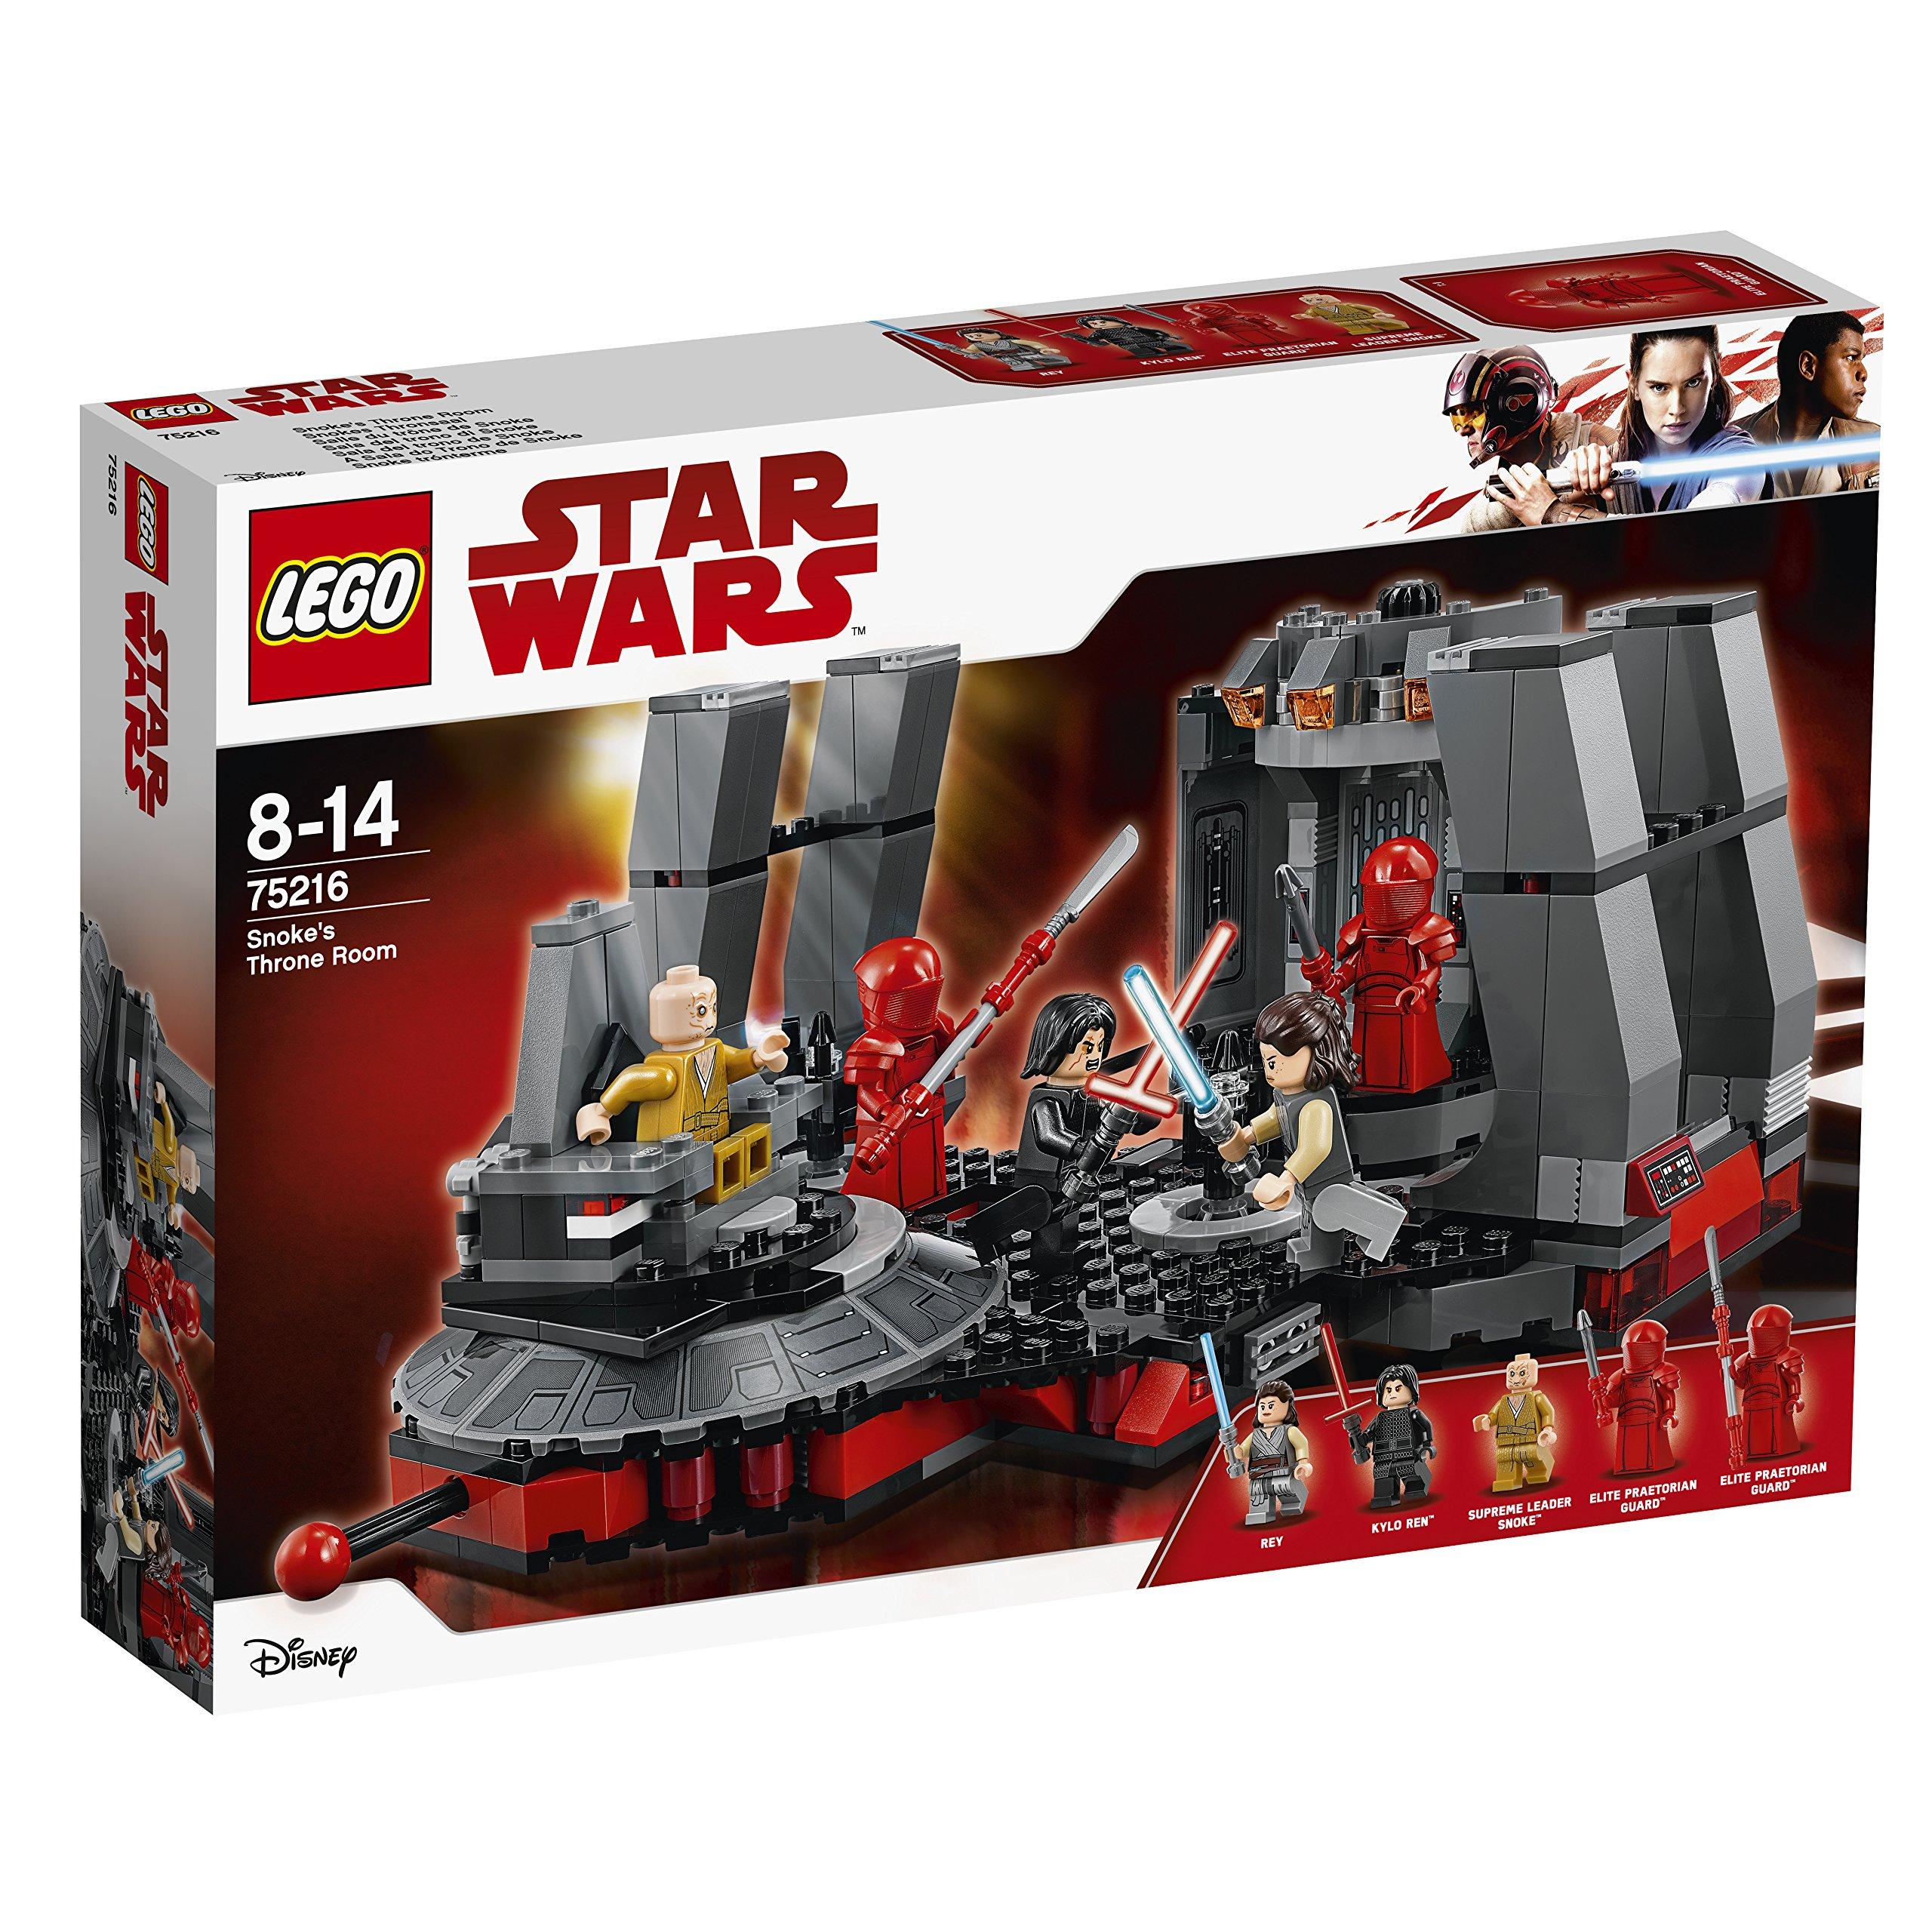 Lego 75216 Star Wars Rey Kylo Ren Supreme Leader Snoke And 2 Elite Praetorian Guards Minifigures Building Set Buy Online In Aruba At Desertcart Productid 69847320